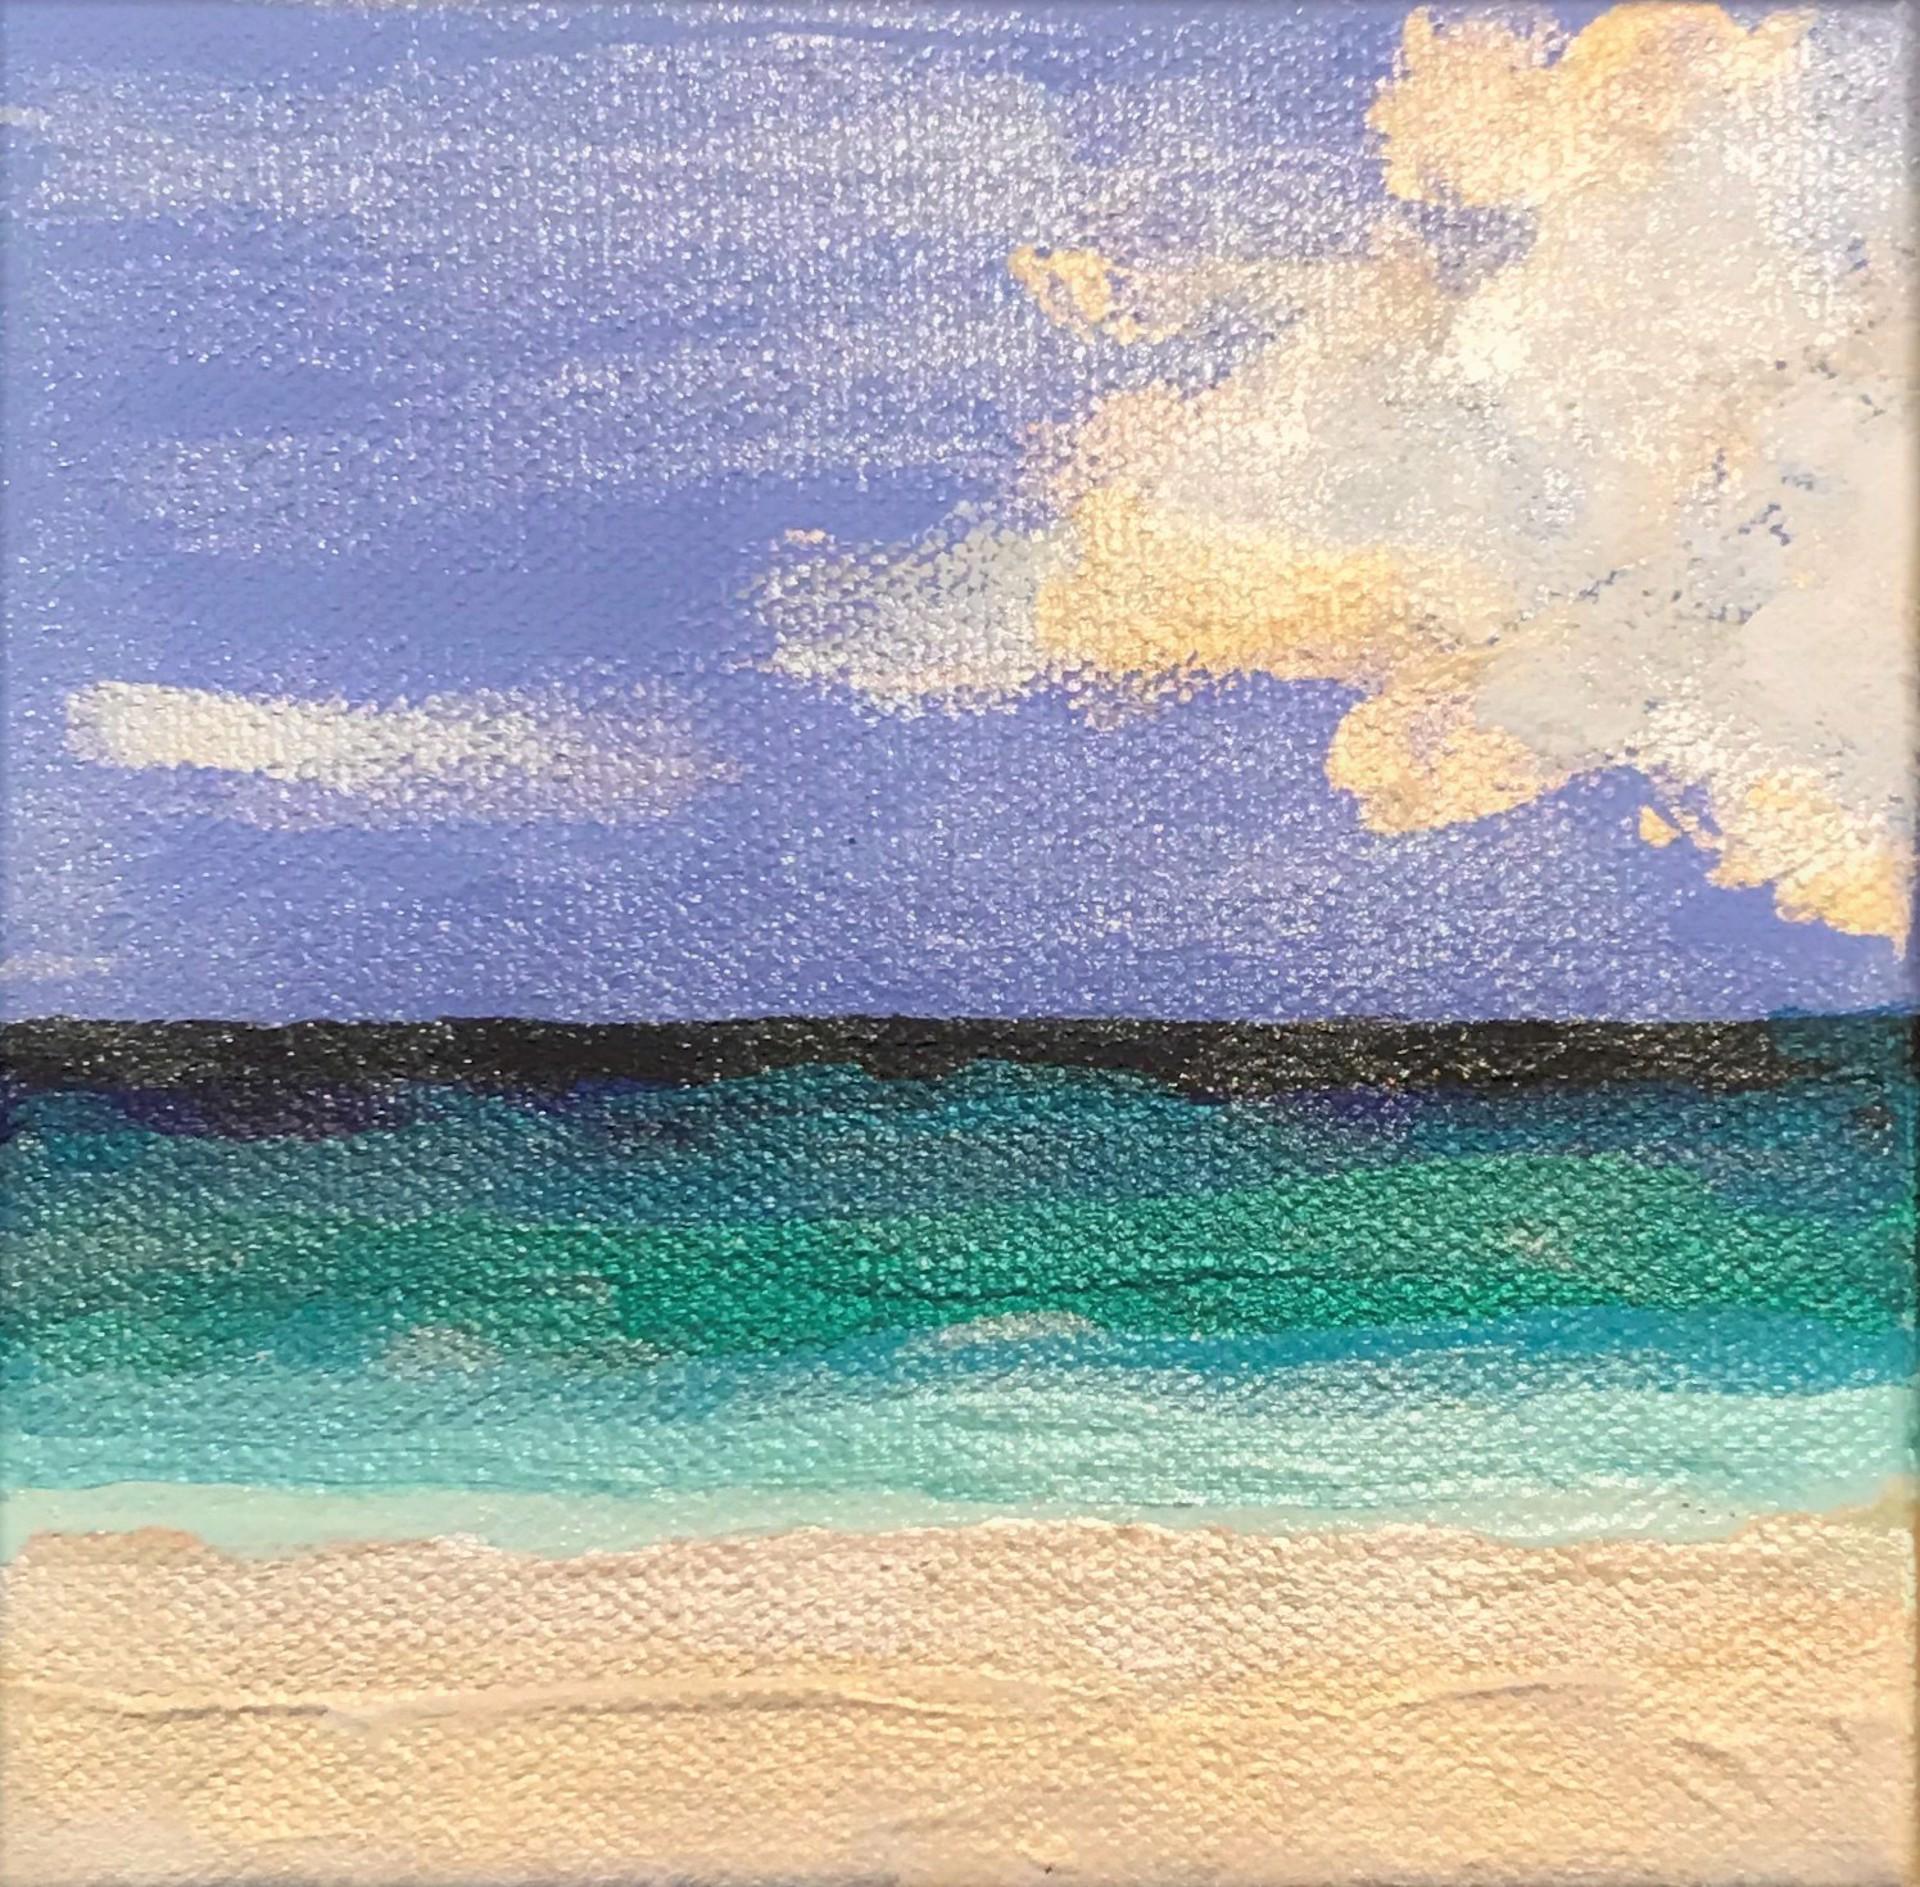 Beachfront No. 10 by Leslie Poteet Busker